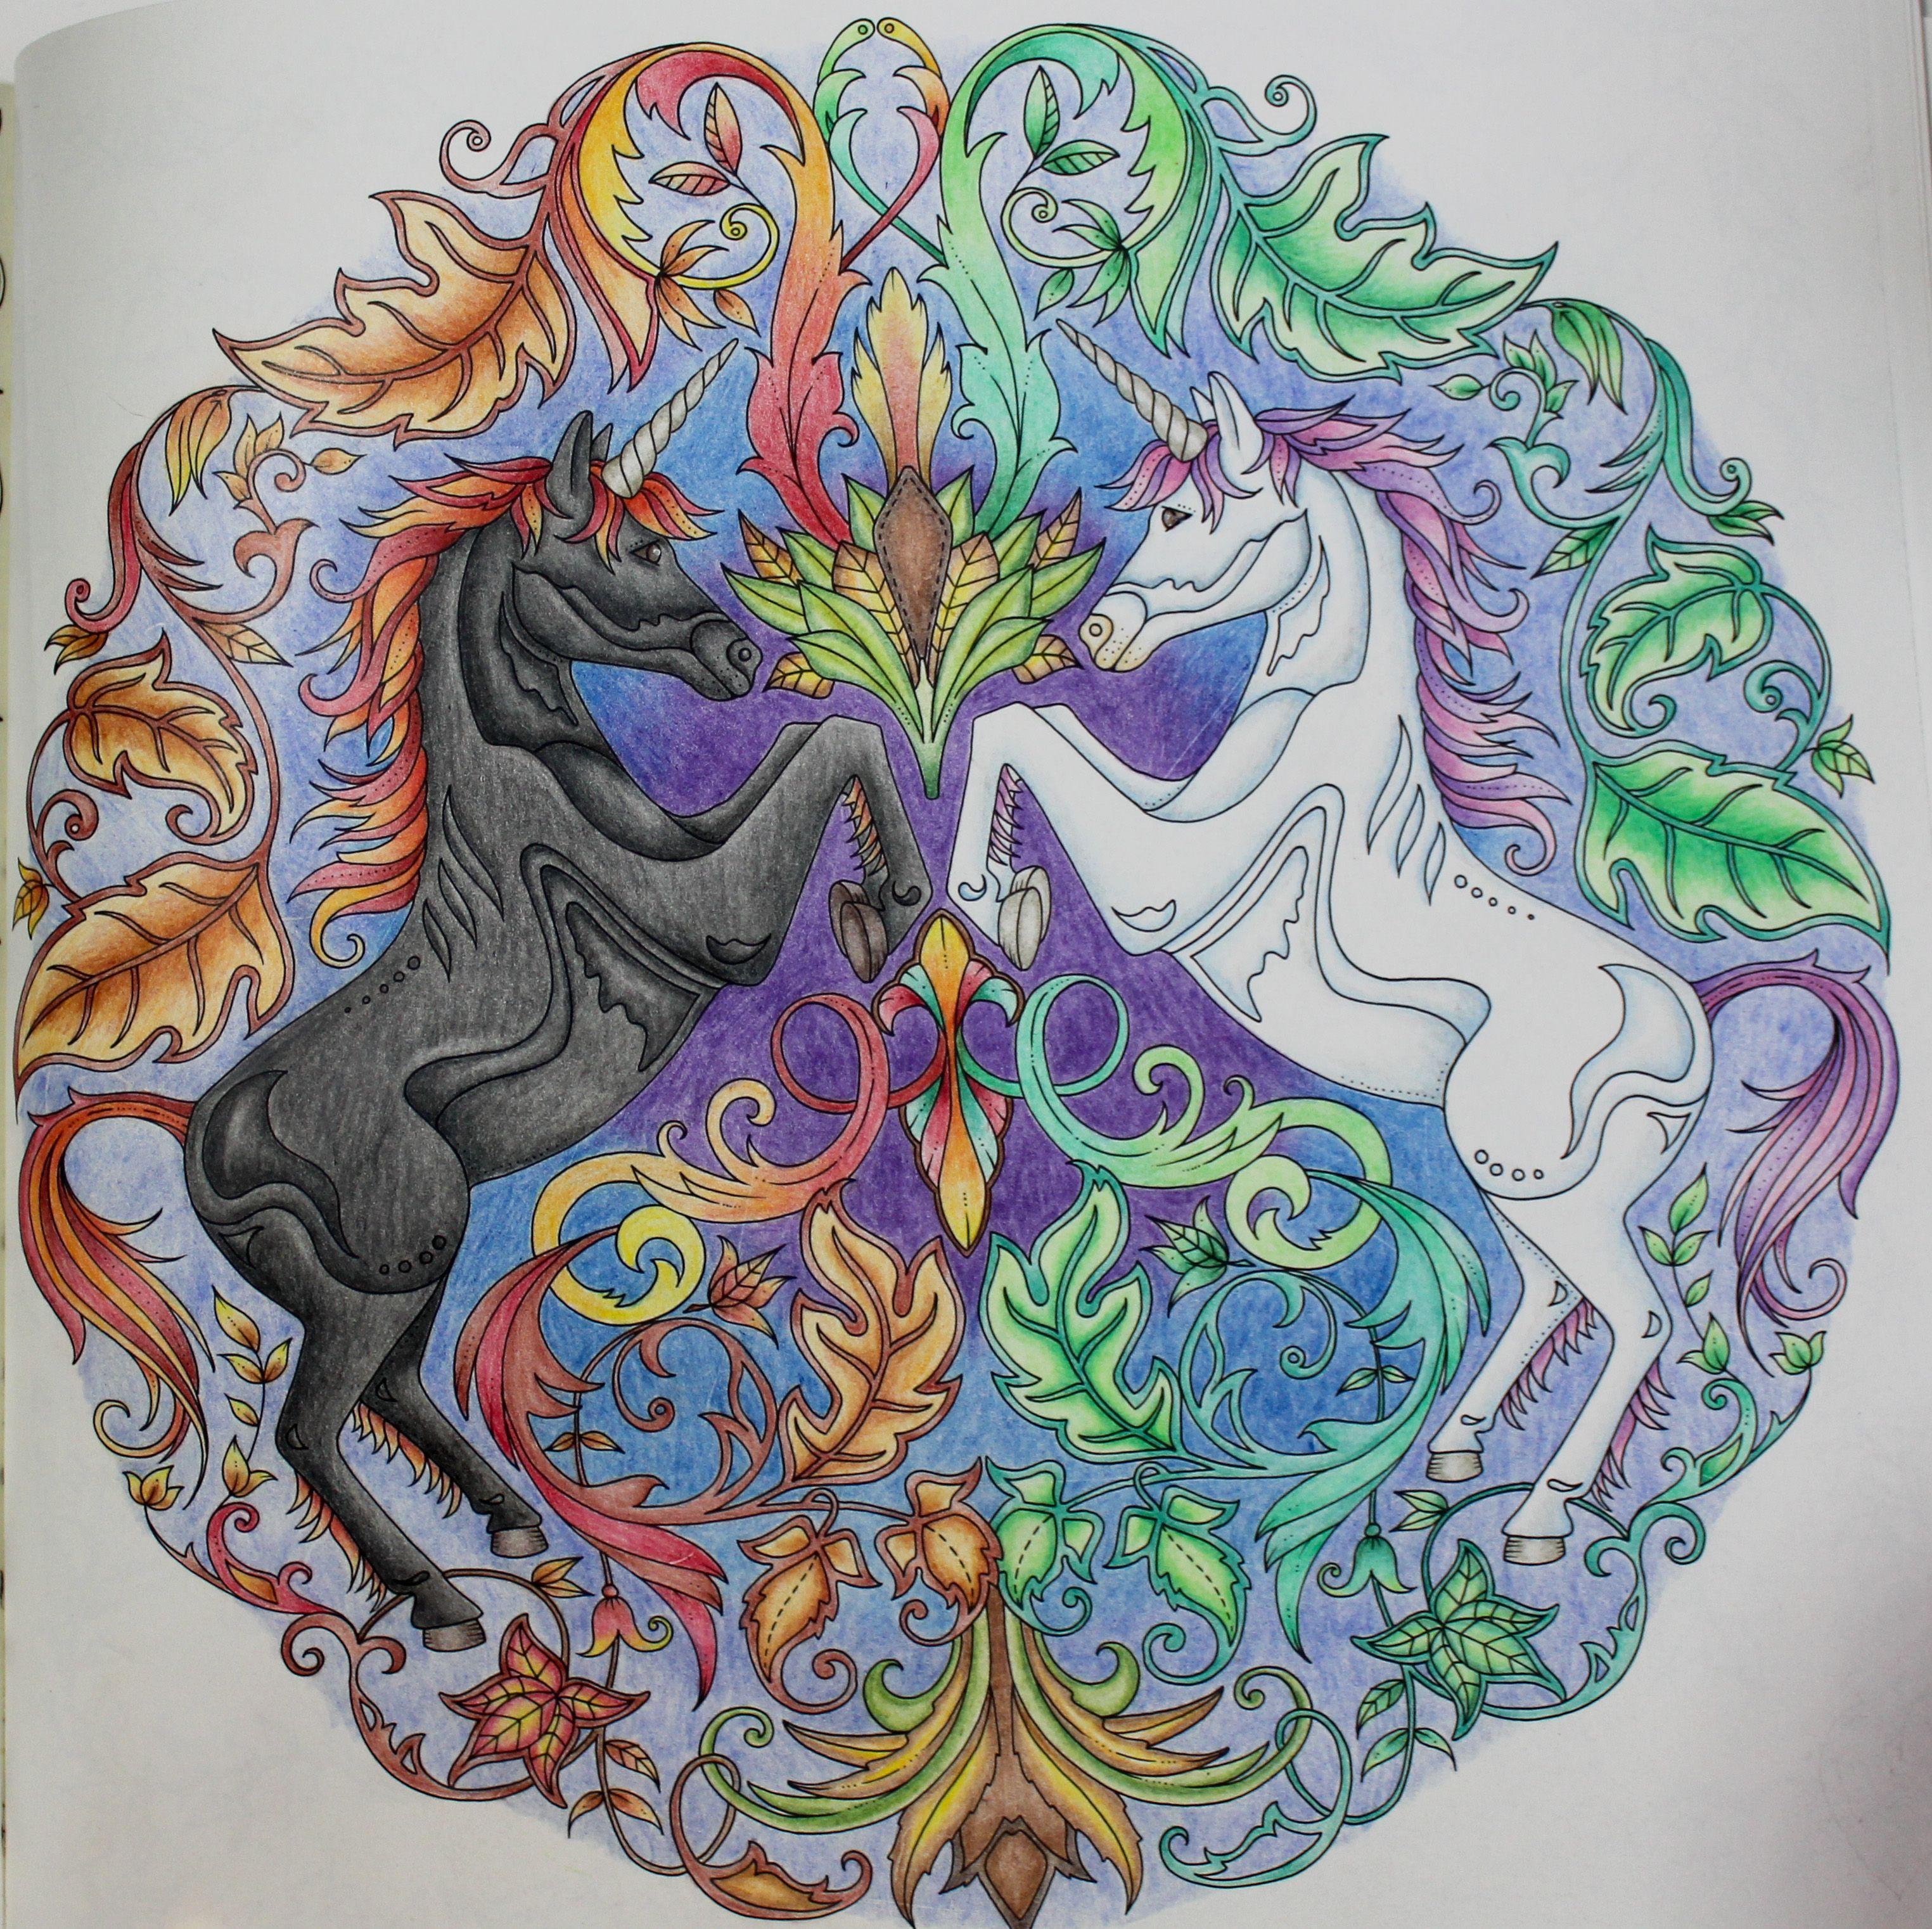 Johanna Basford - Enchanted Forest unicorns